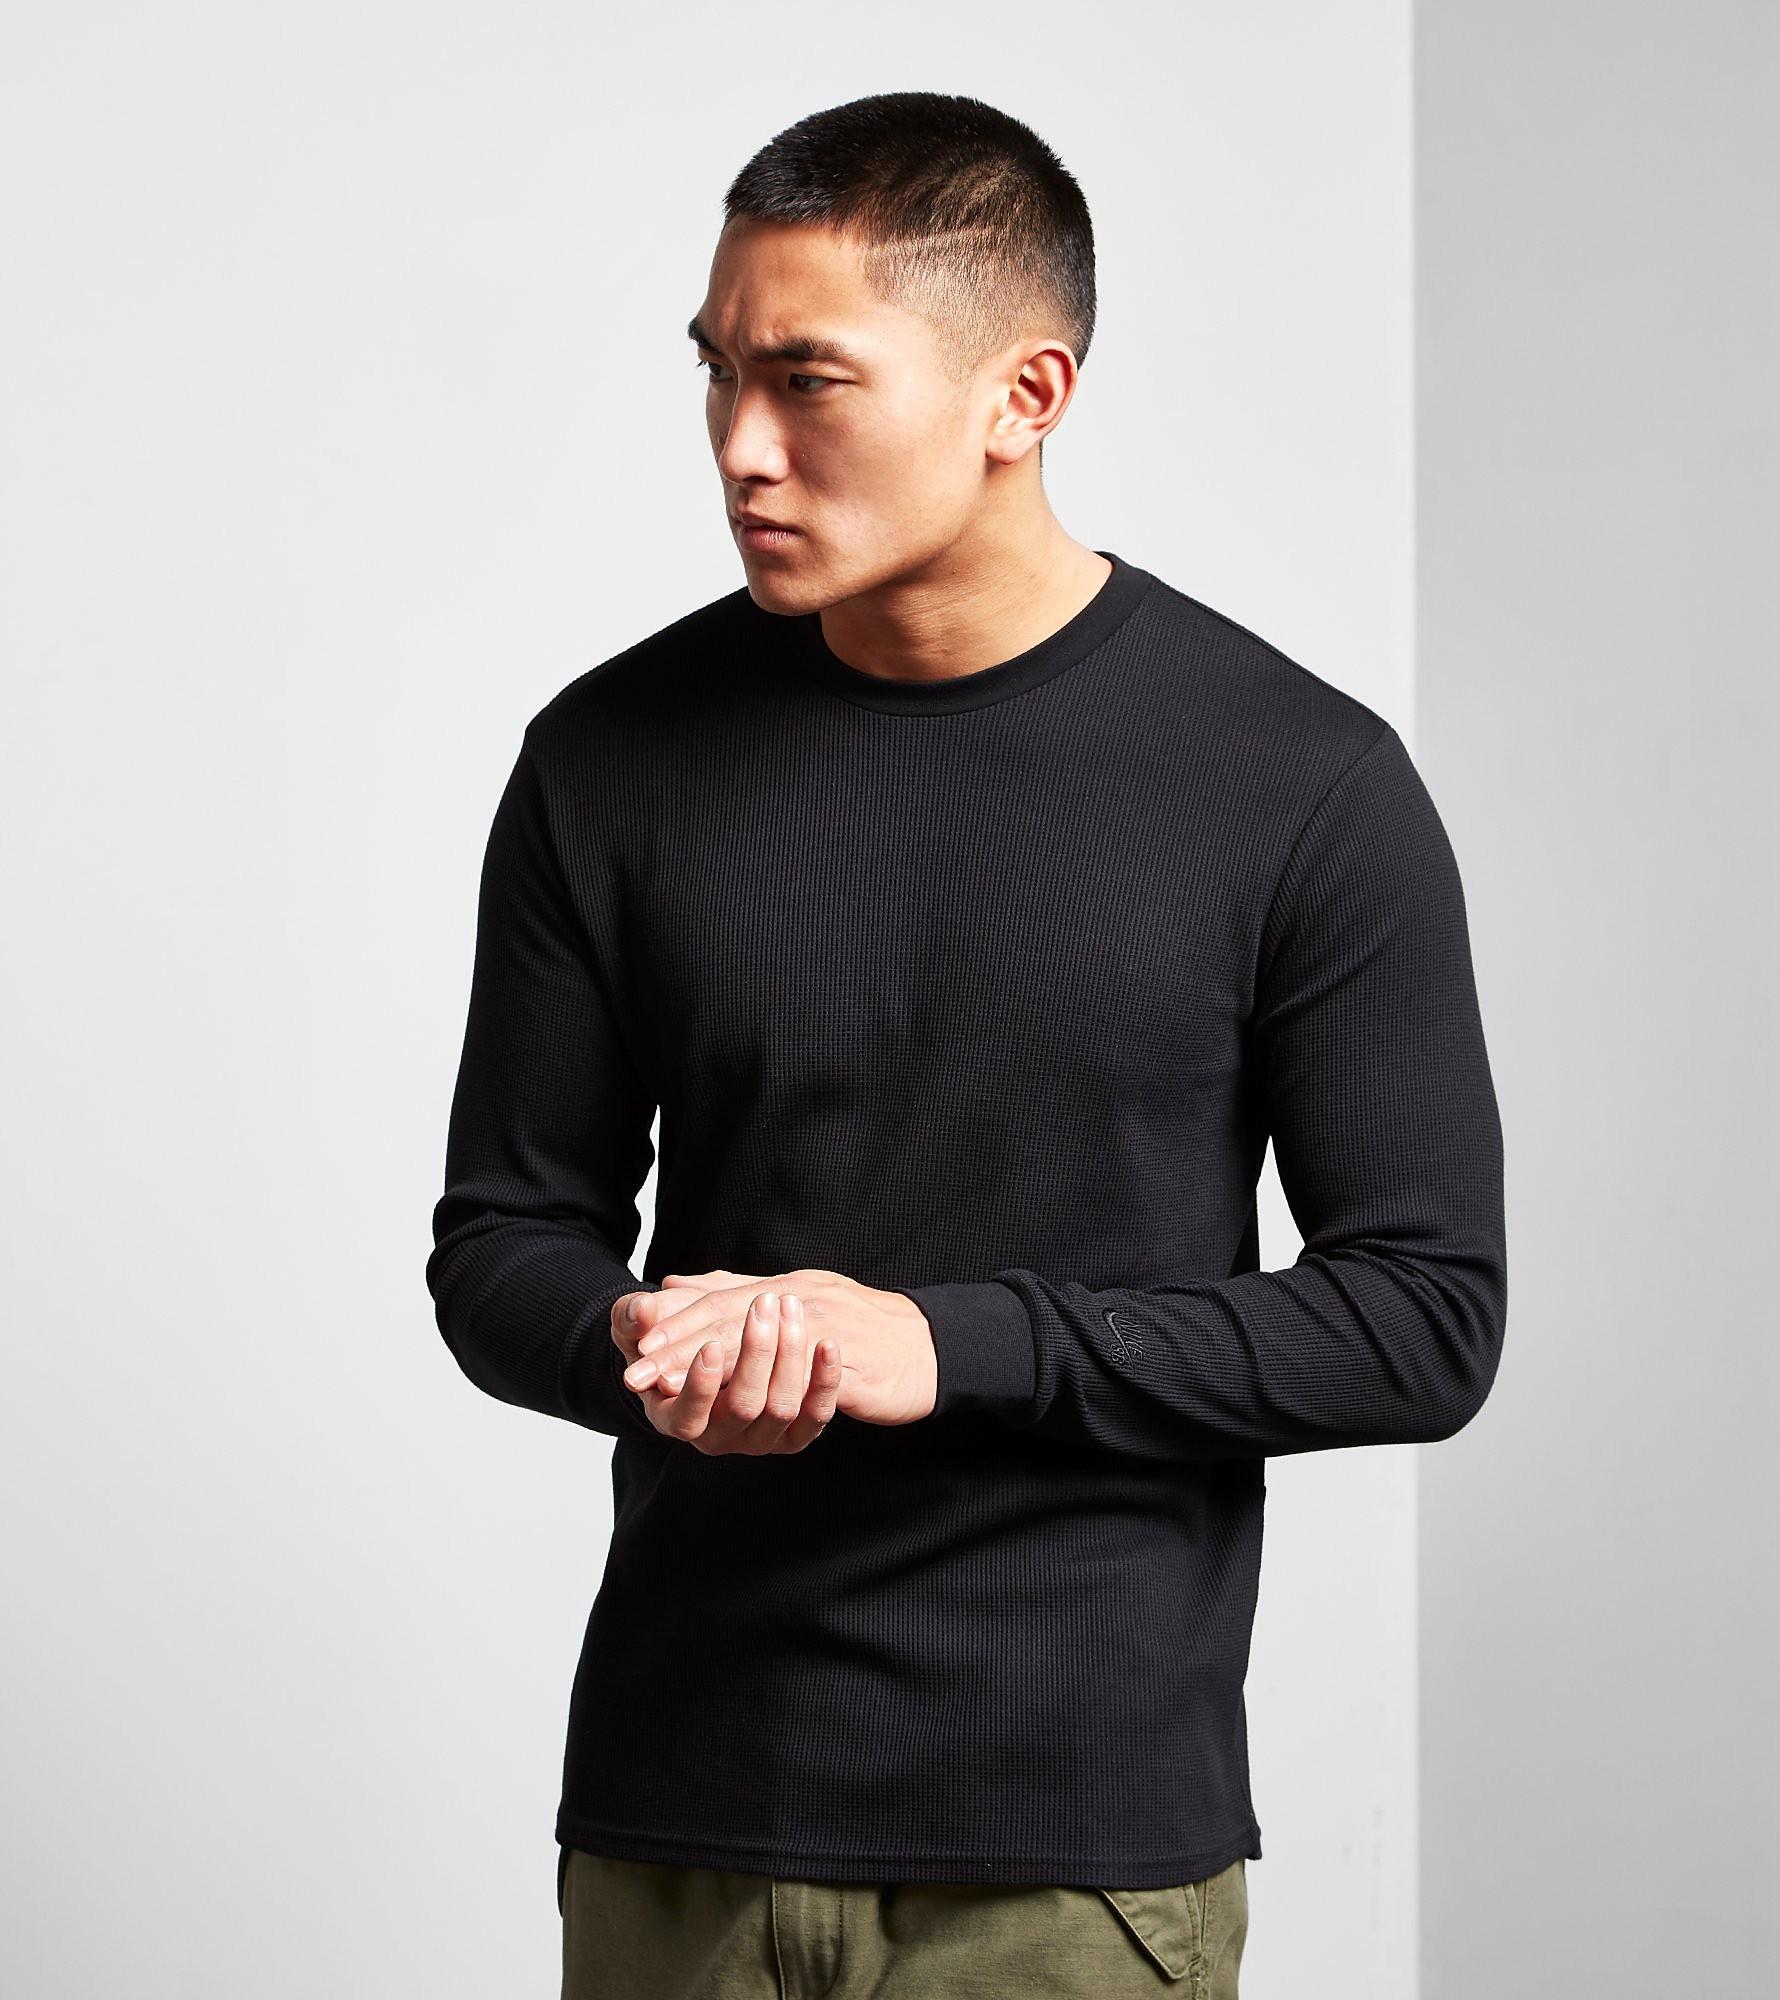 Nike SB Long-Sleeved Thermal T-Shirt